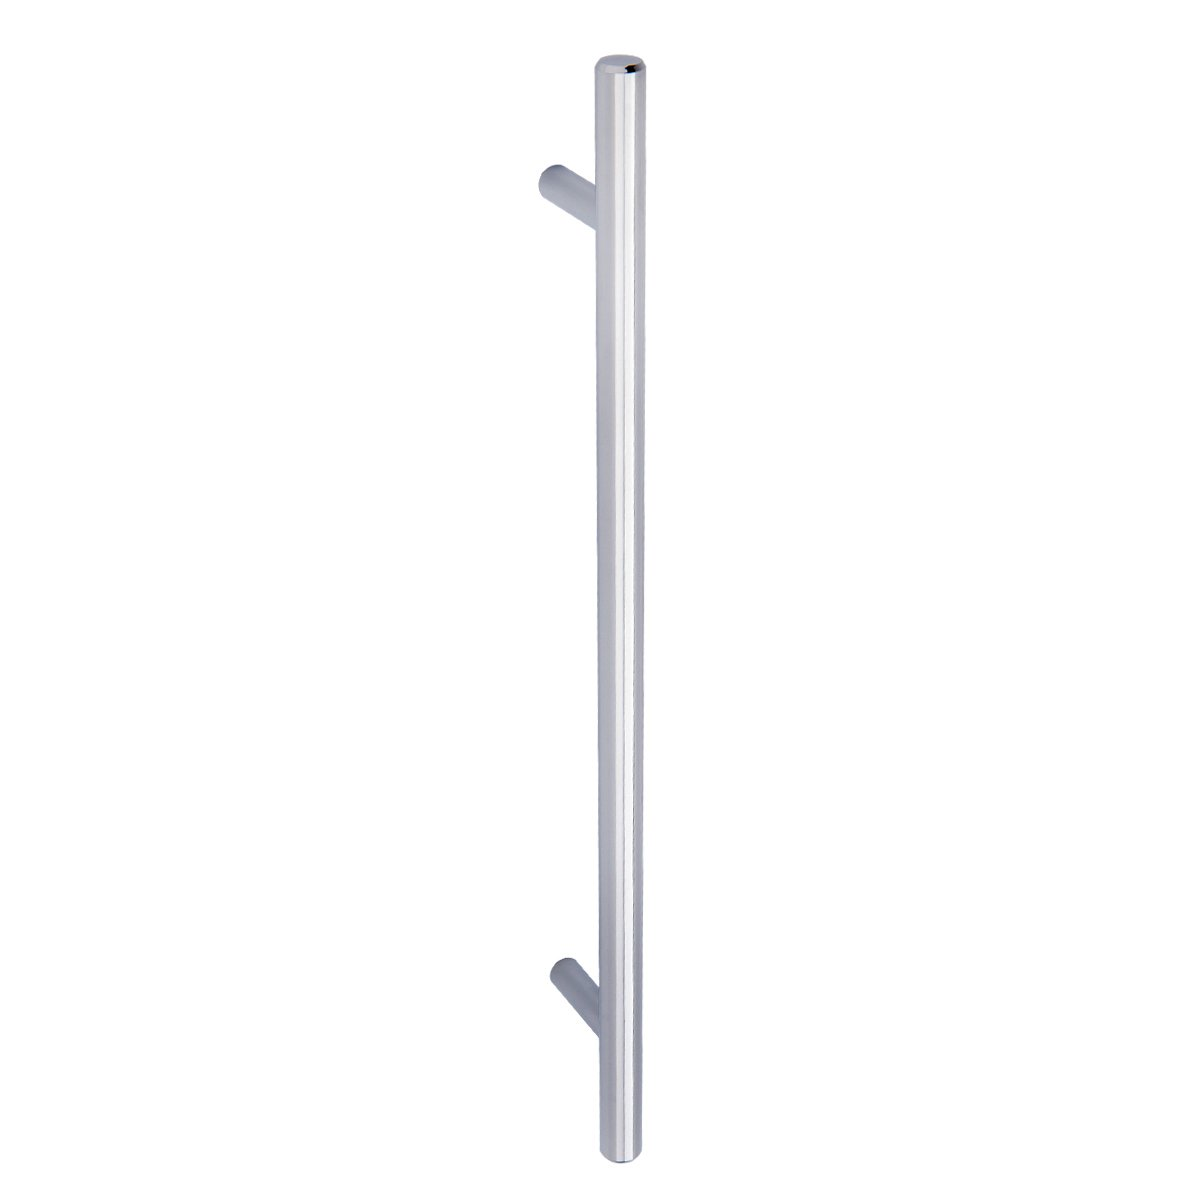 9,52 mm de di/ámetro 18,75 cm de longitud orificio central de 12,7 cm Tirador de armario en forma de barra Basics tipo europeo cromo pulido paquete de 25